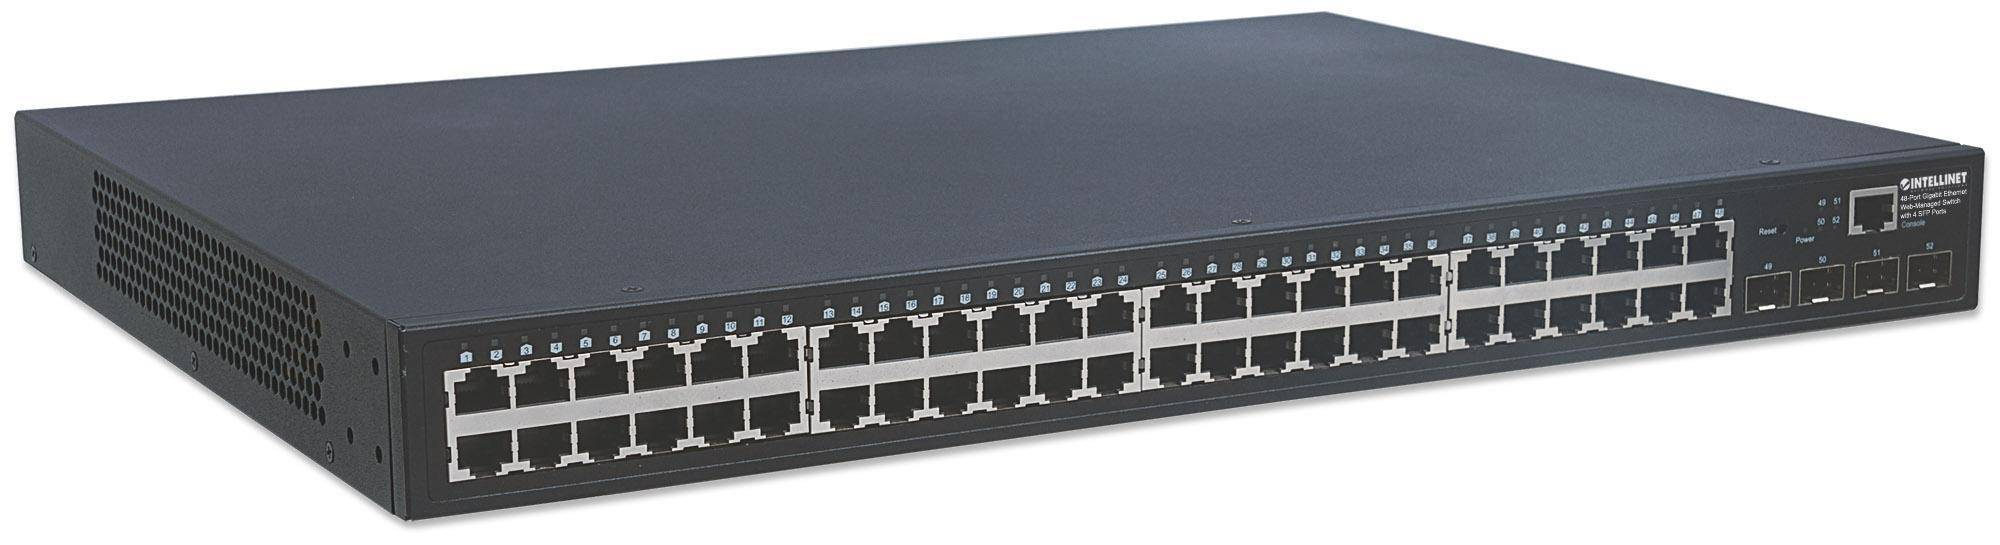 intellinet switch ethernet 48 porte gigabit web-managed con 4 porte sfp